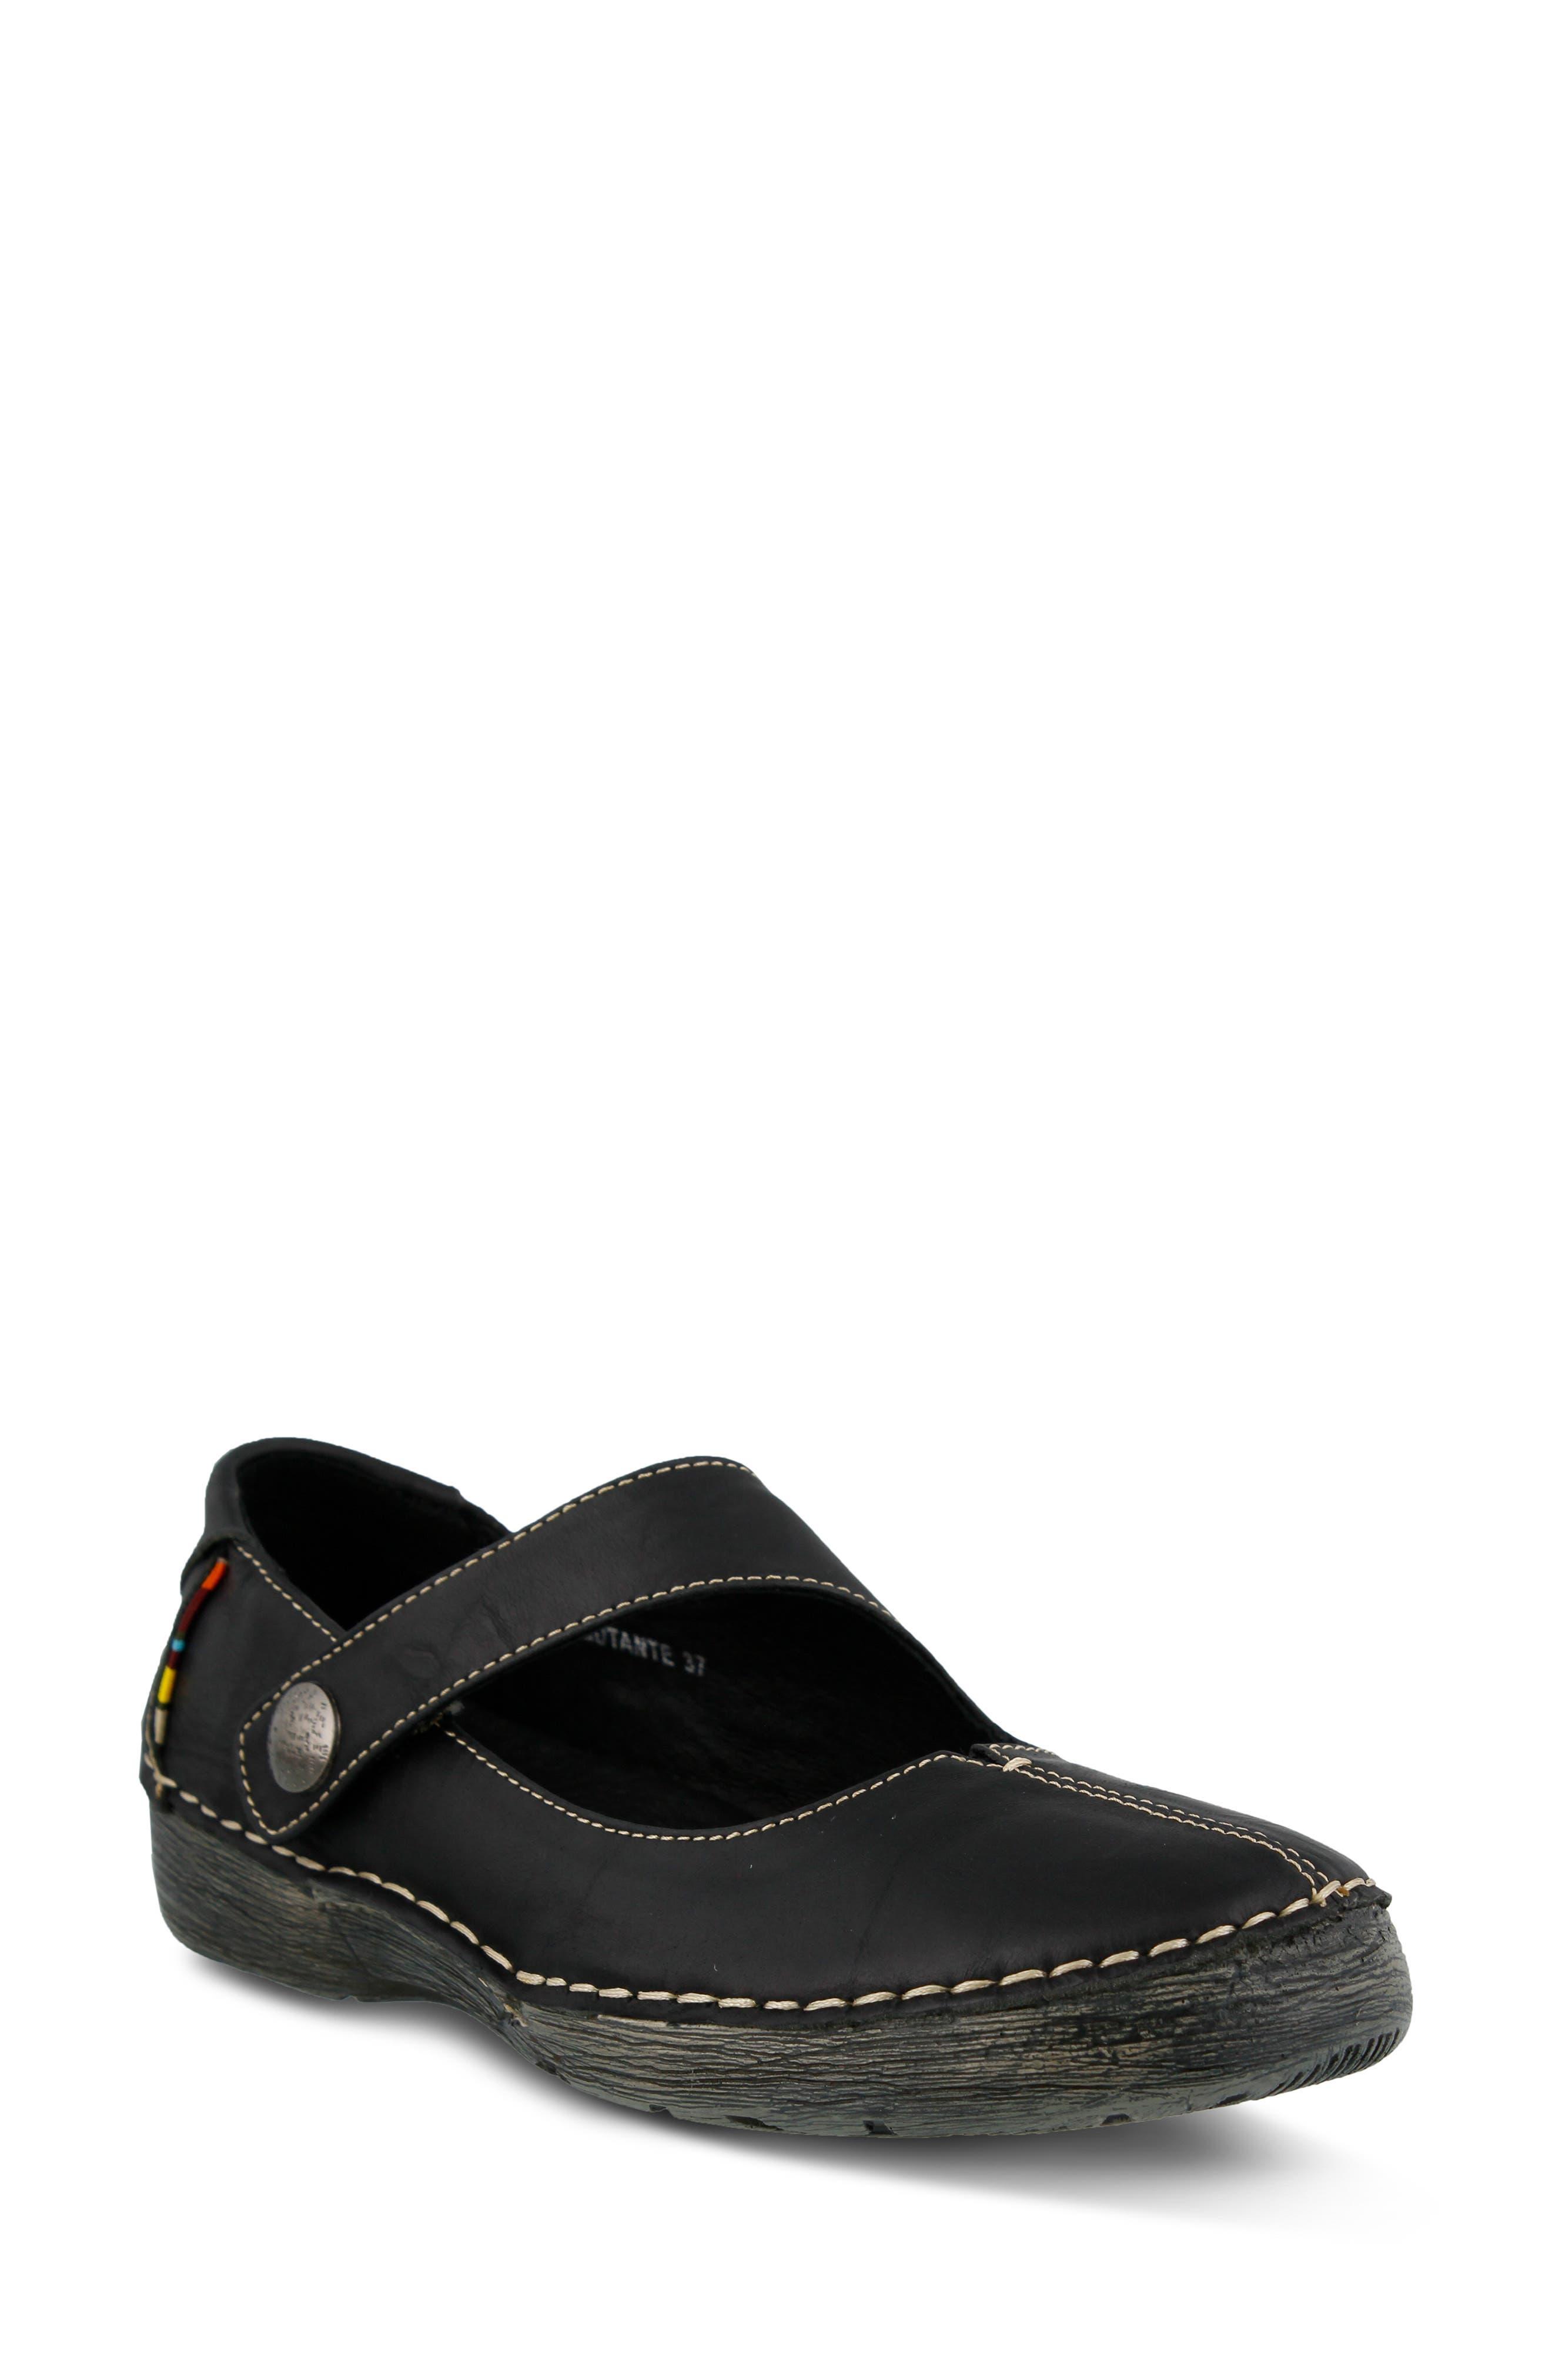 Spring Step Debutante Flat - Black